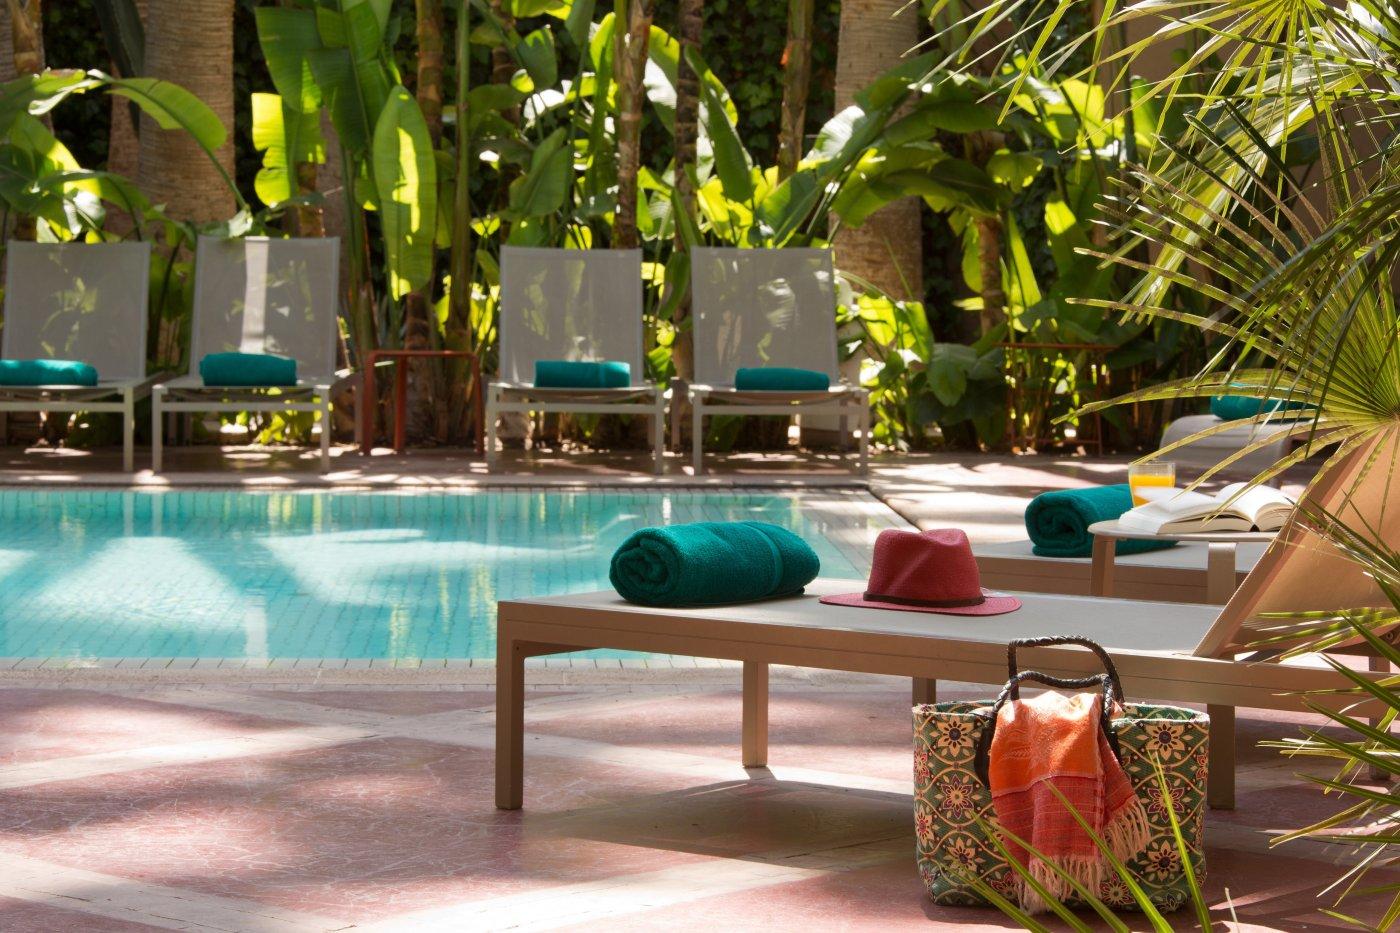 jardins-medina-marrakech-piscine